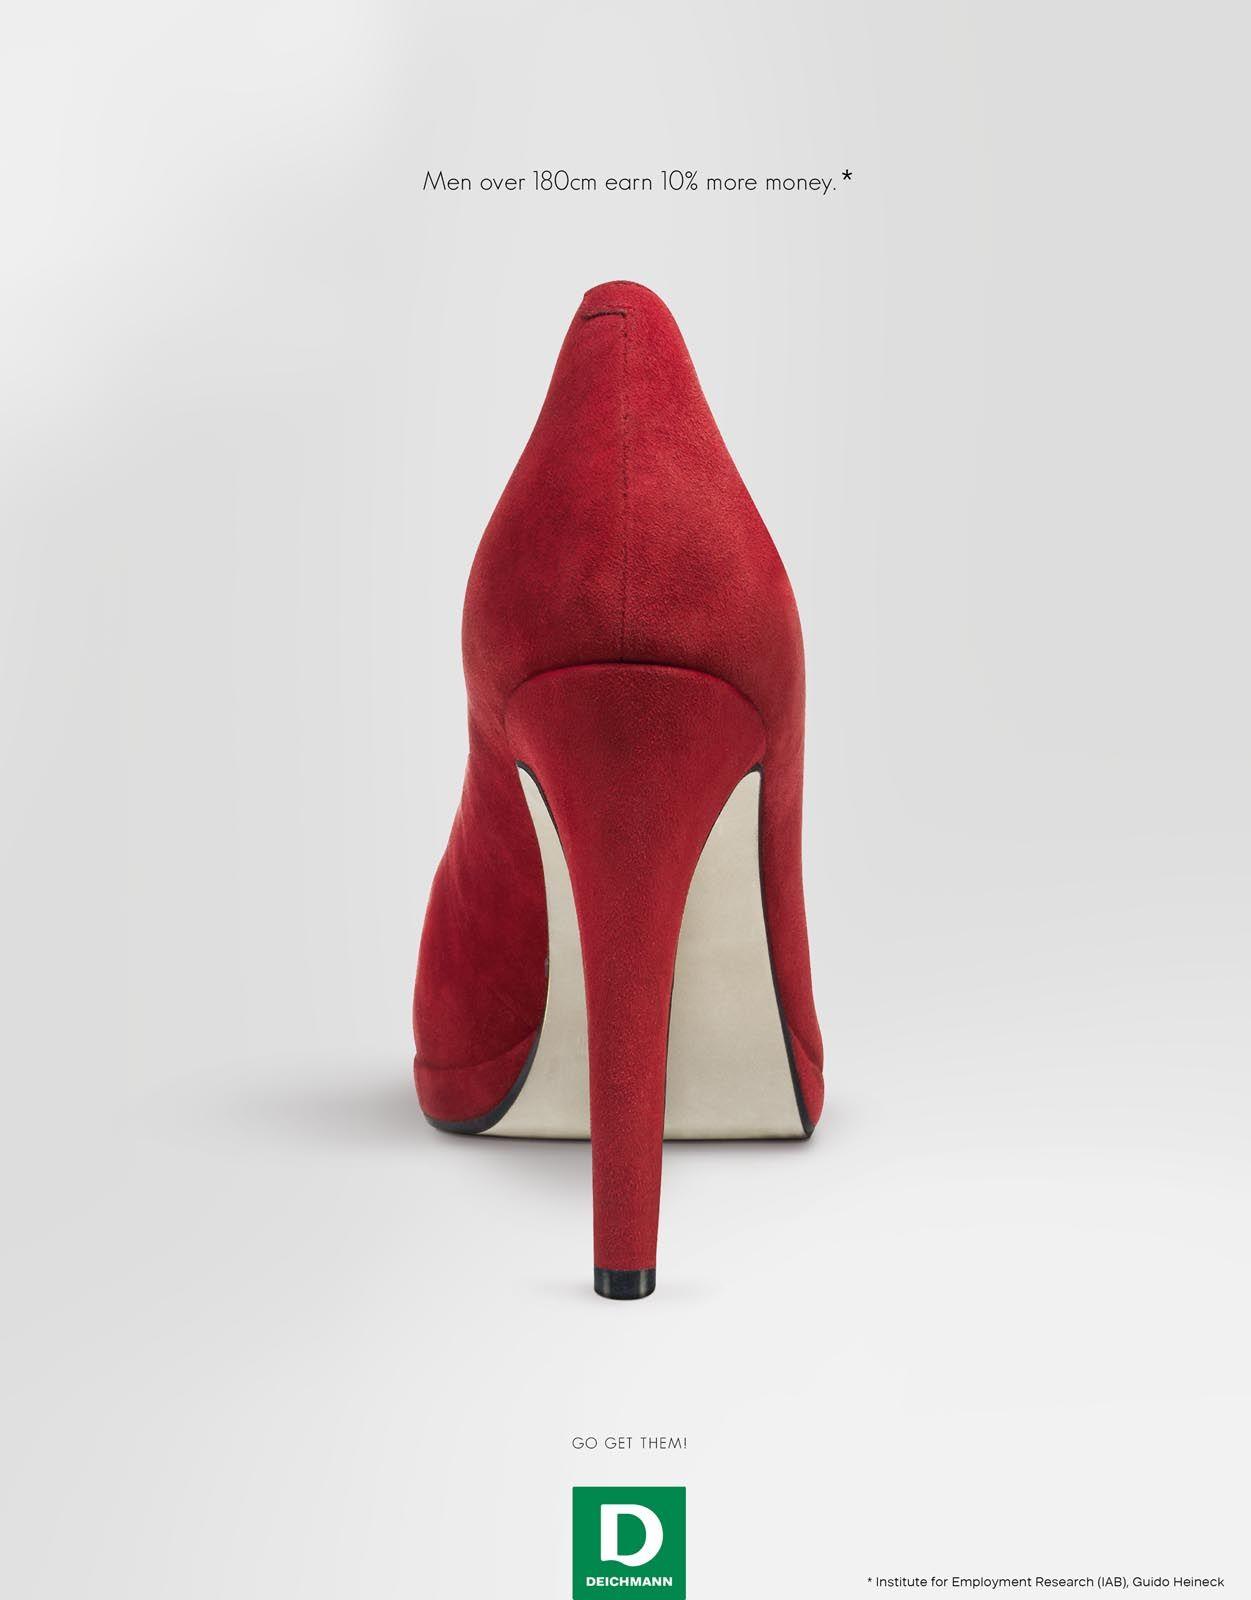 1eee7695399 Deichmann: Facts | Ads | Louboutin shoes, Heels, High heels